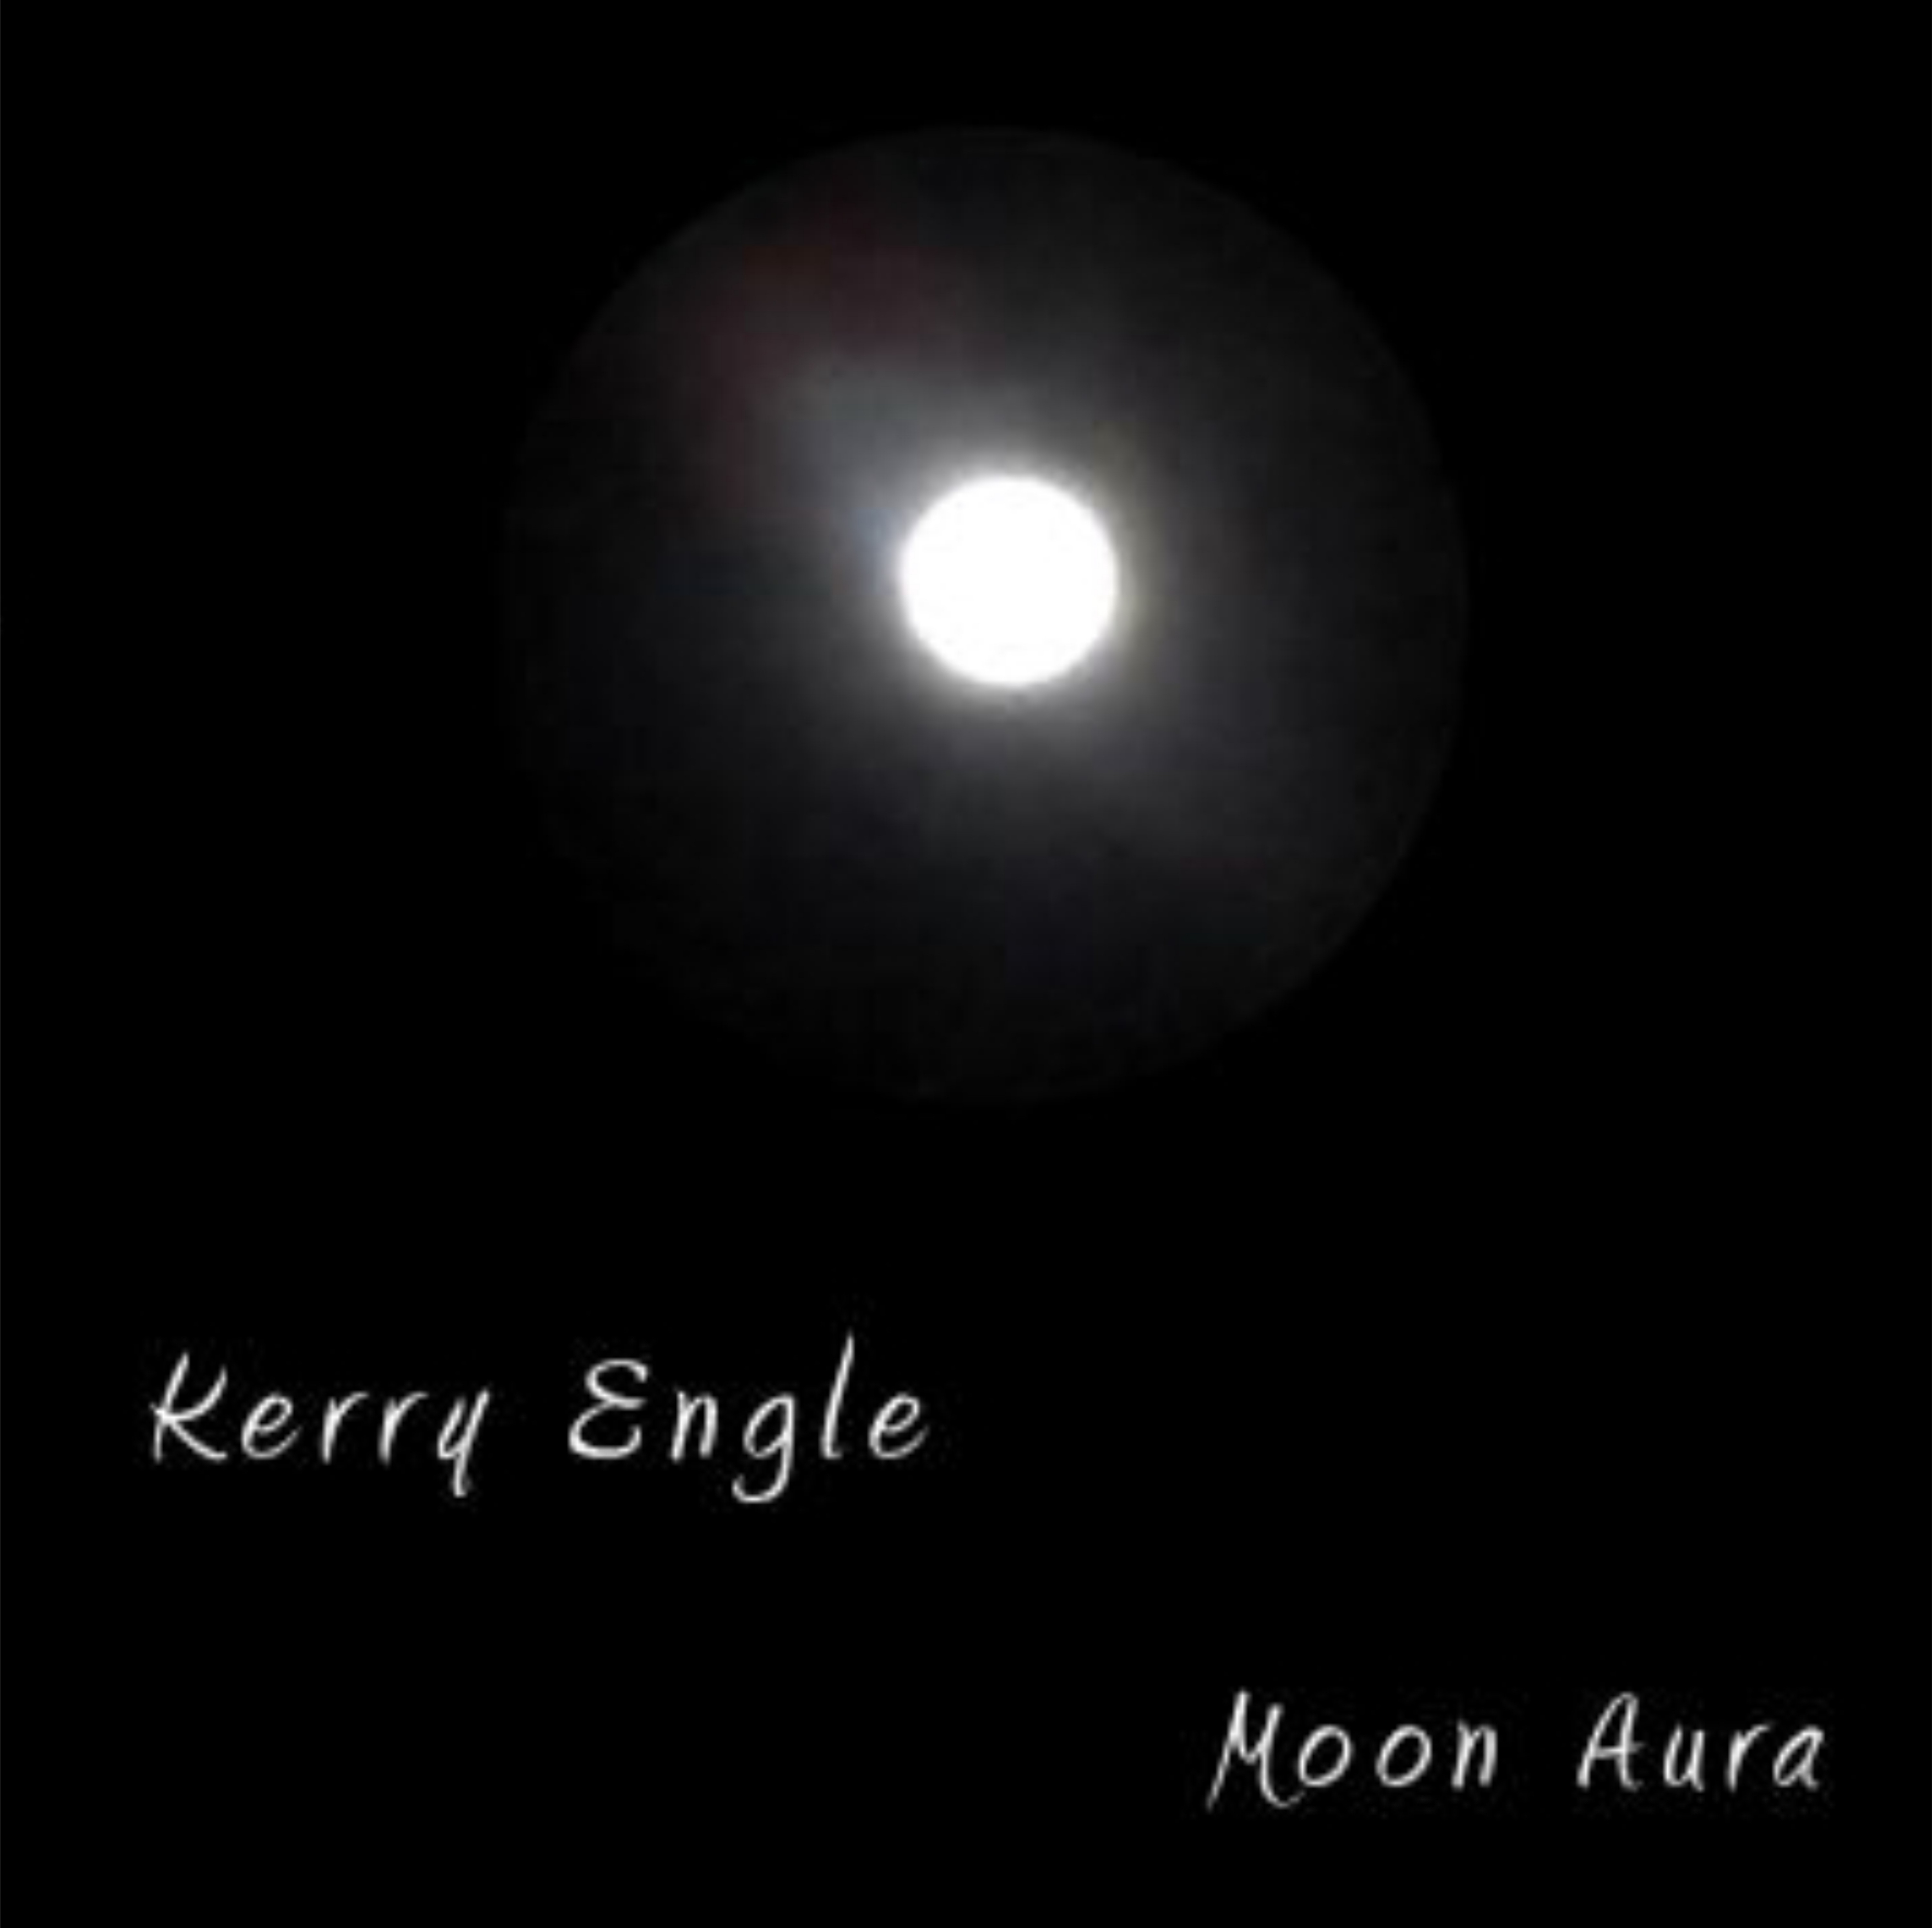 Moon Aura 4000 x 4000